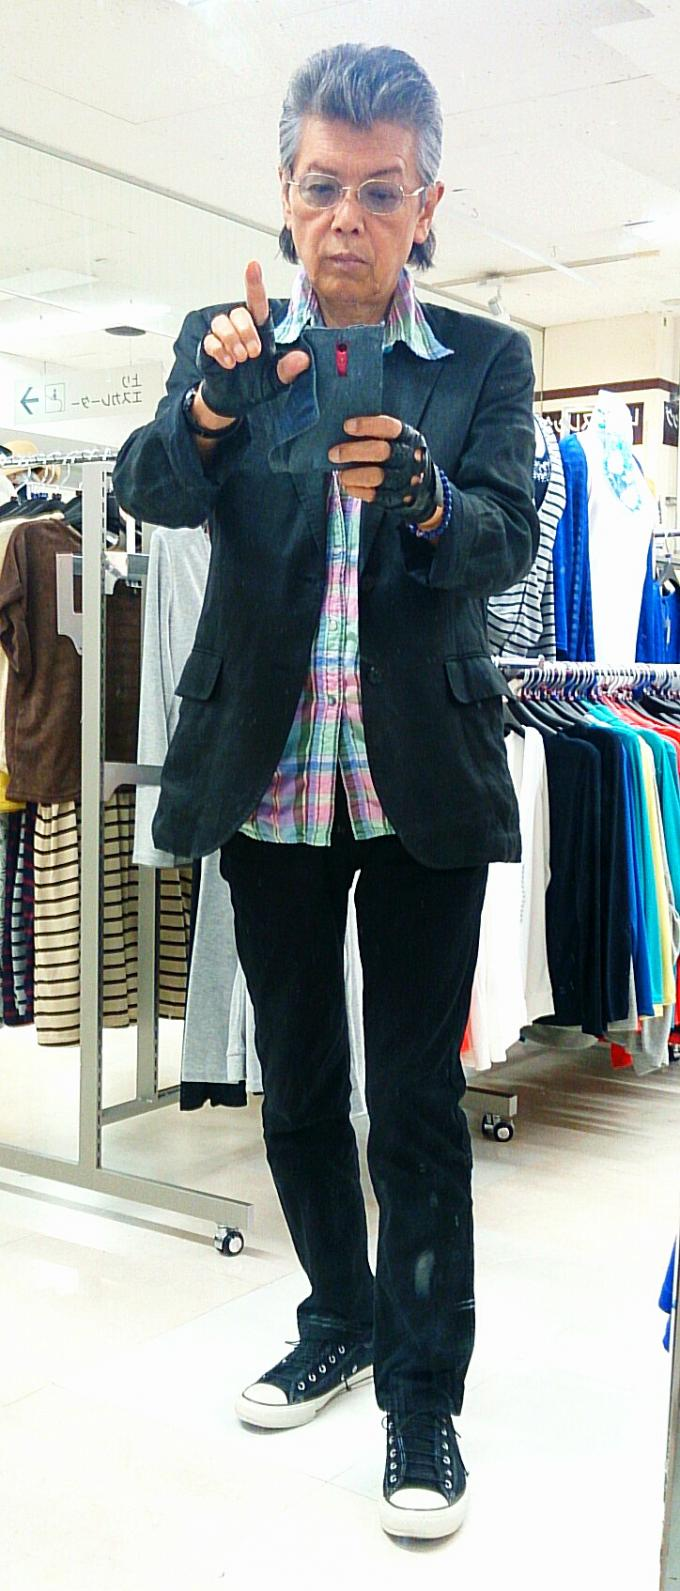 KEN'NNY_20140721